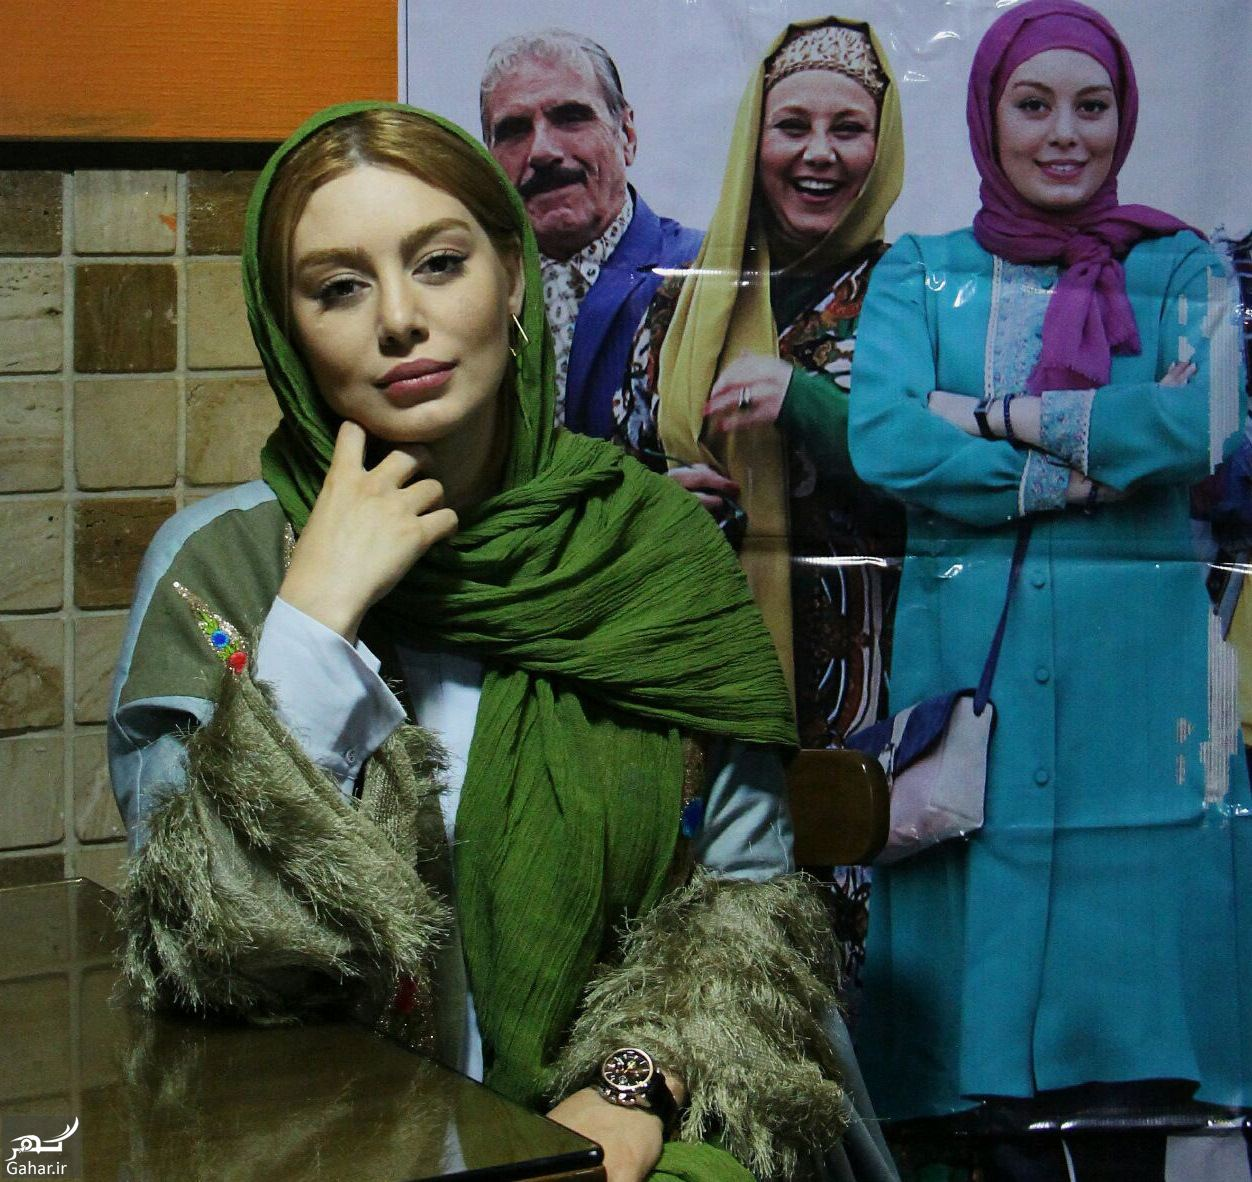 170424 Gahar ir عکس های اکران مردمی «پا تو کفش من نکن» با حضور سحر قریشی در مشهد